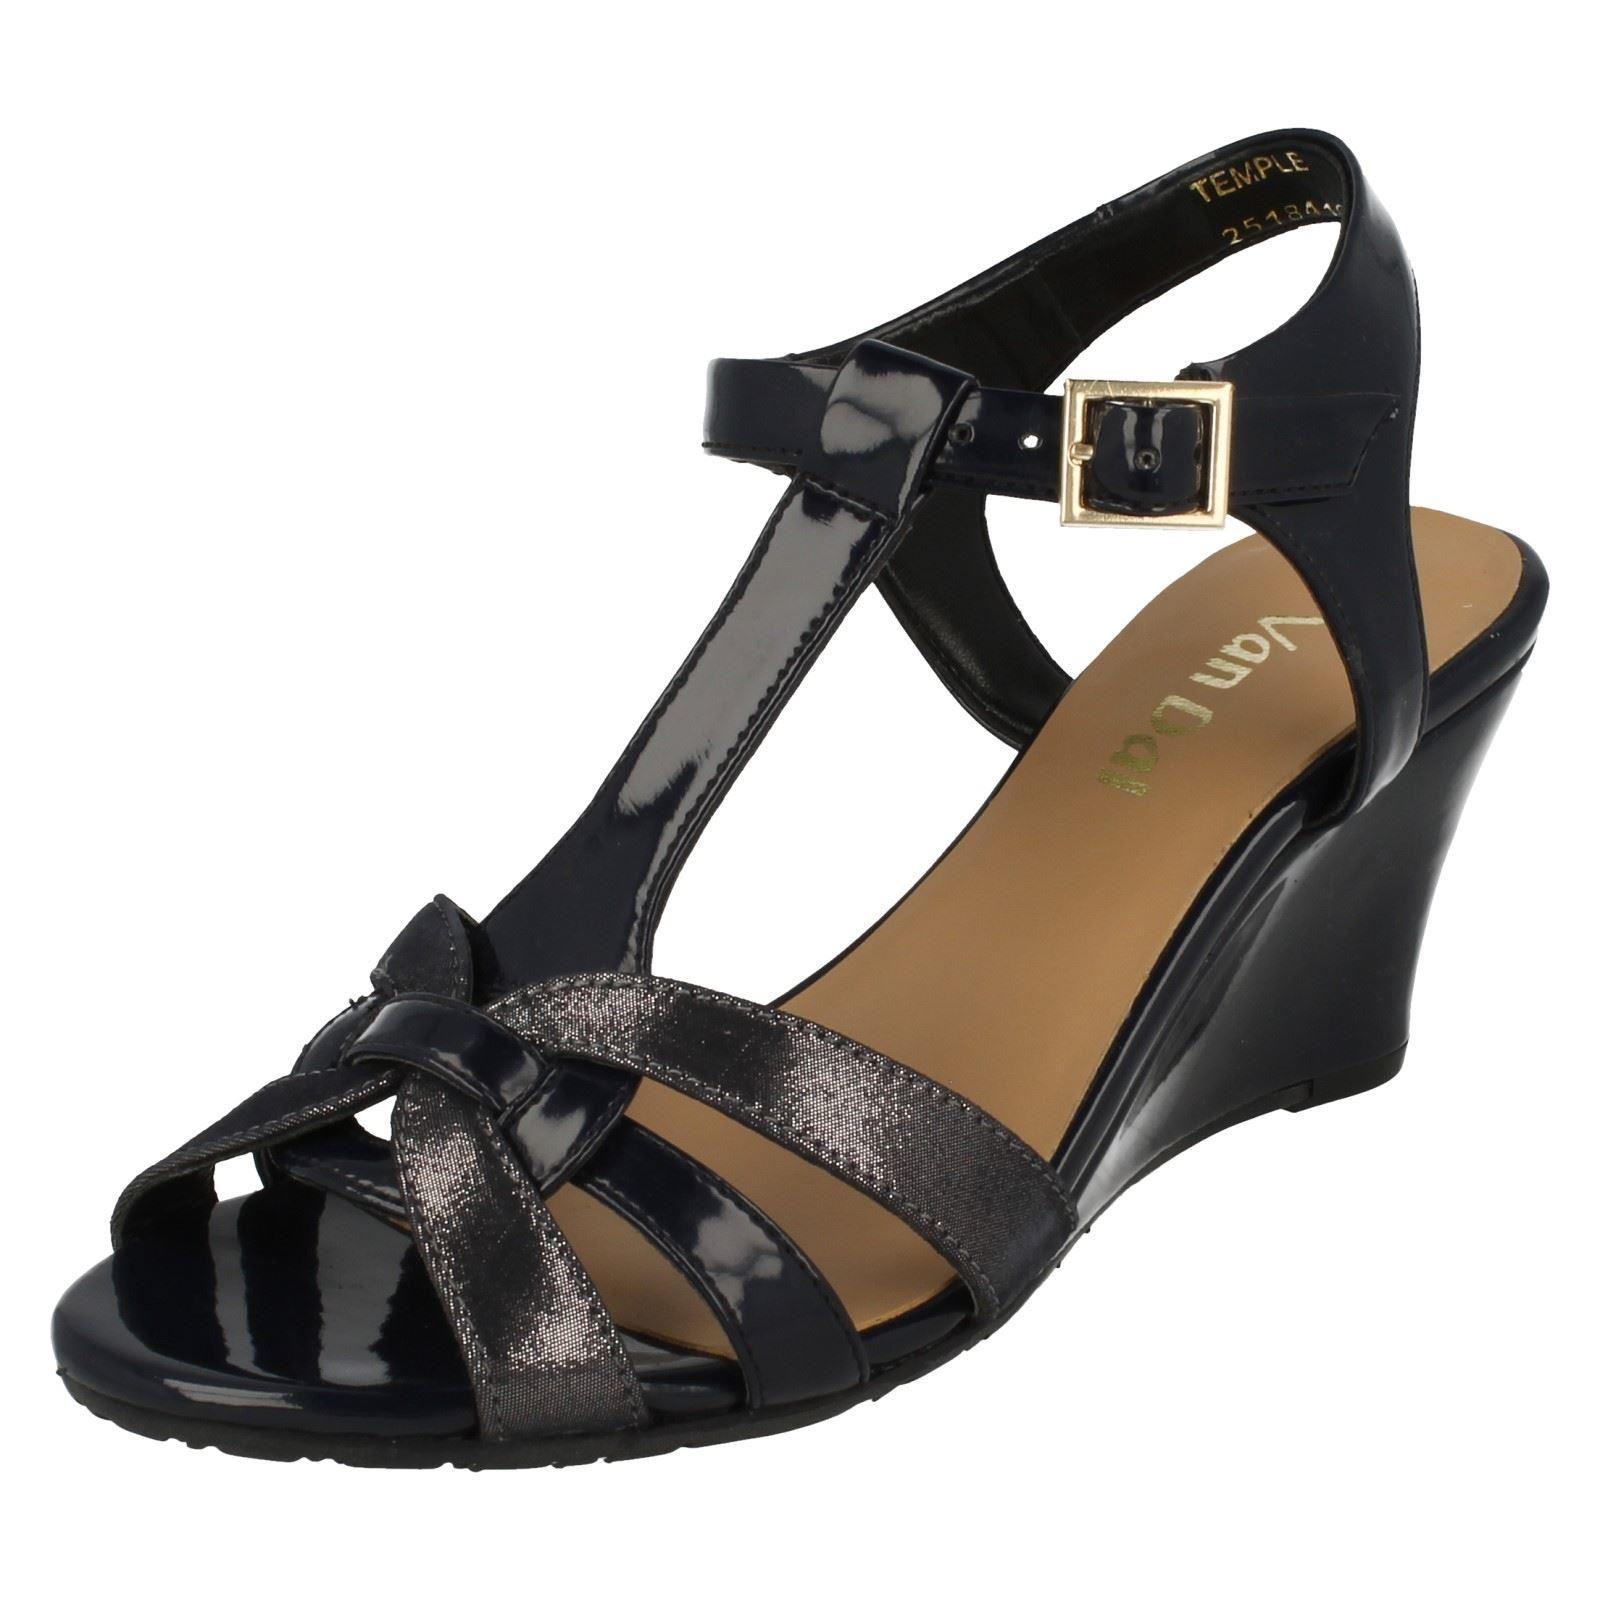 Ladies Van Dal T-Bar Wedge Sandals Temple